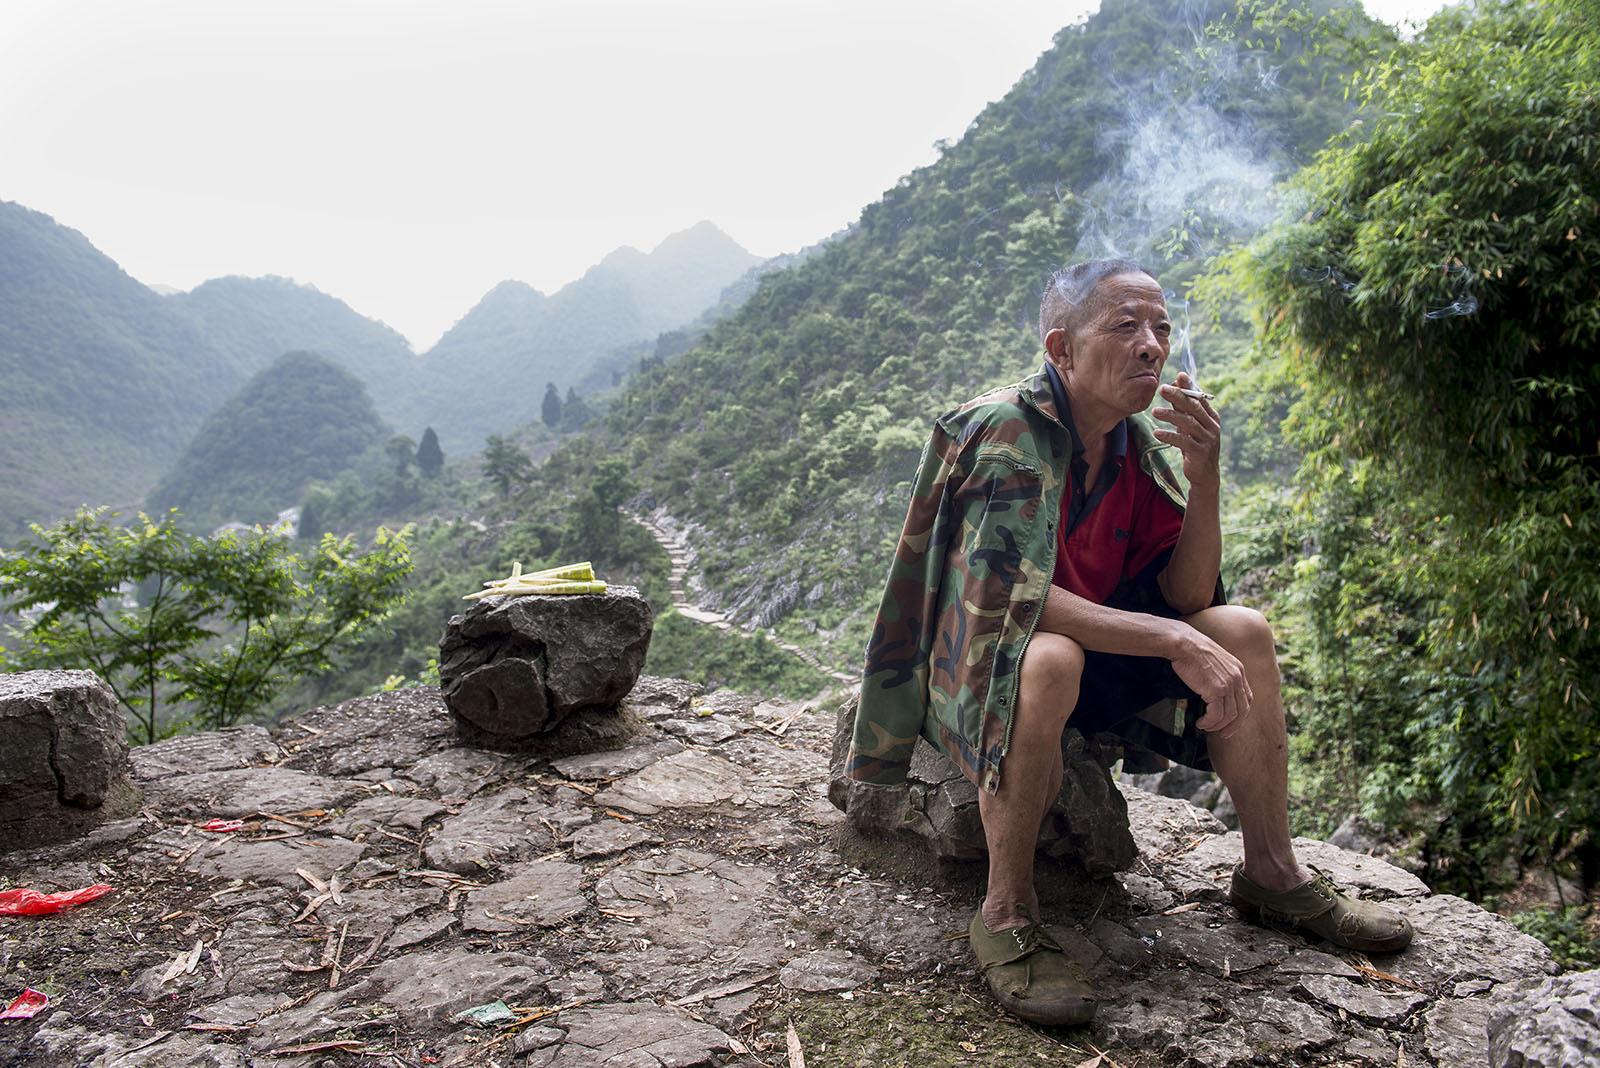 photography-tour-yunnan-china-01